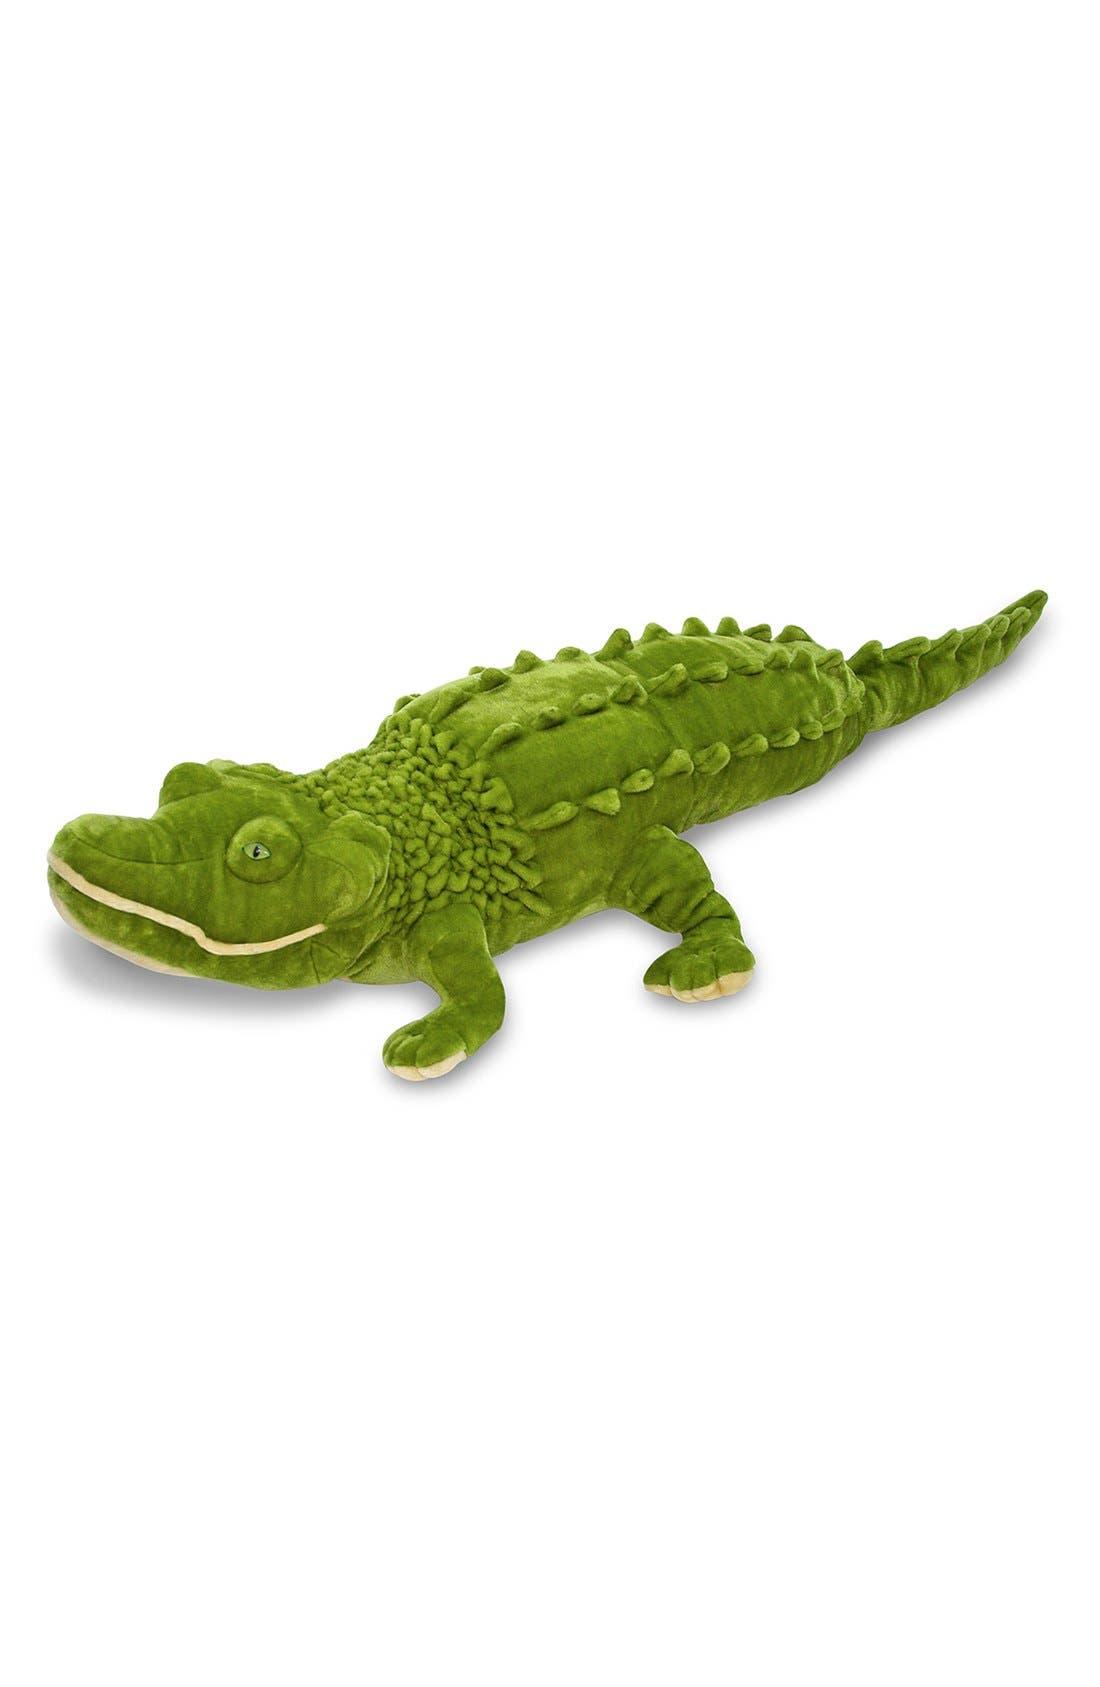 MELISSA & DOUG Oversized Alligator